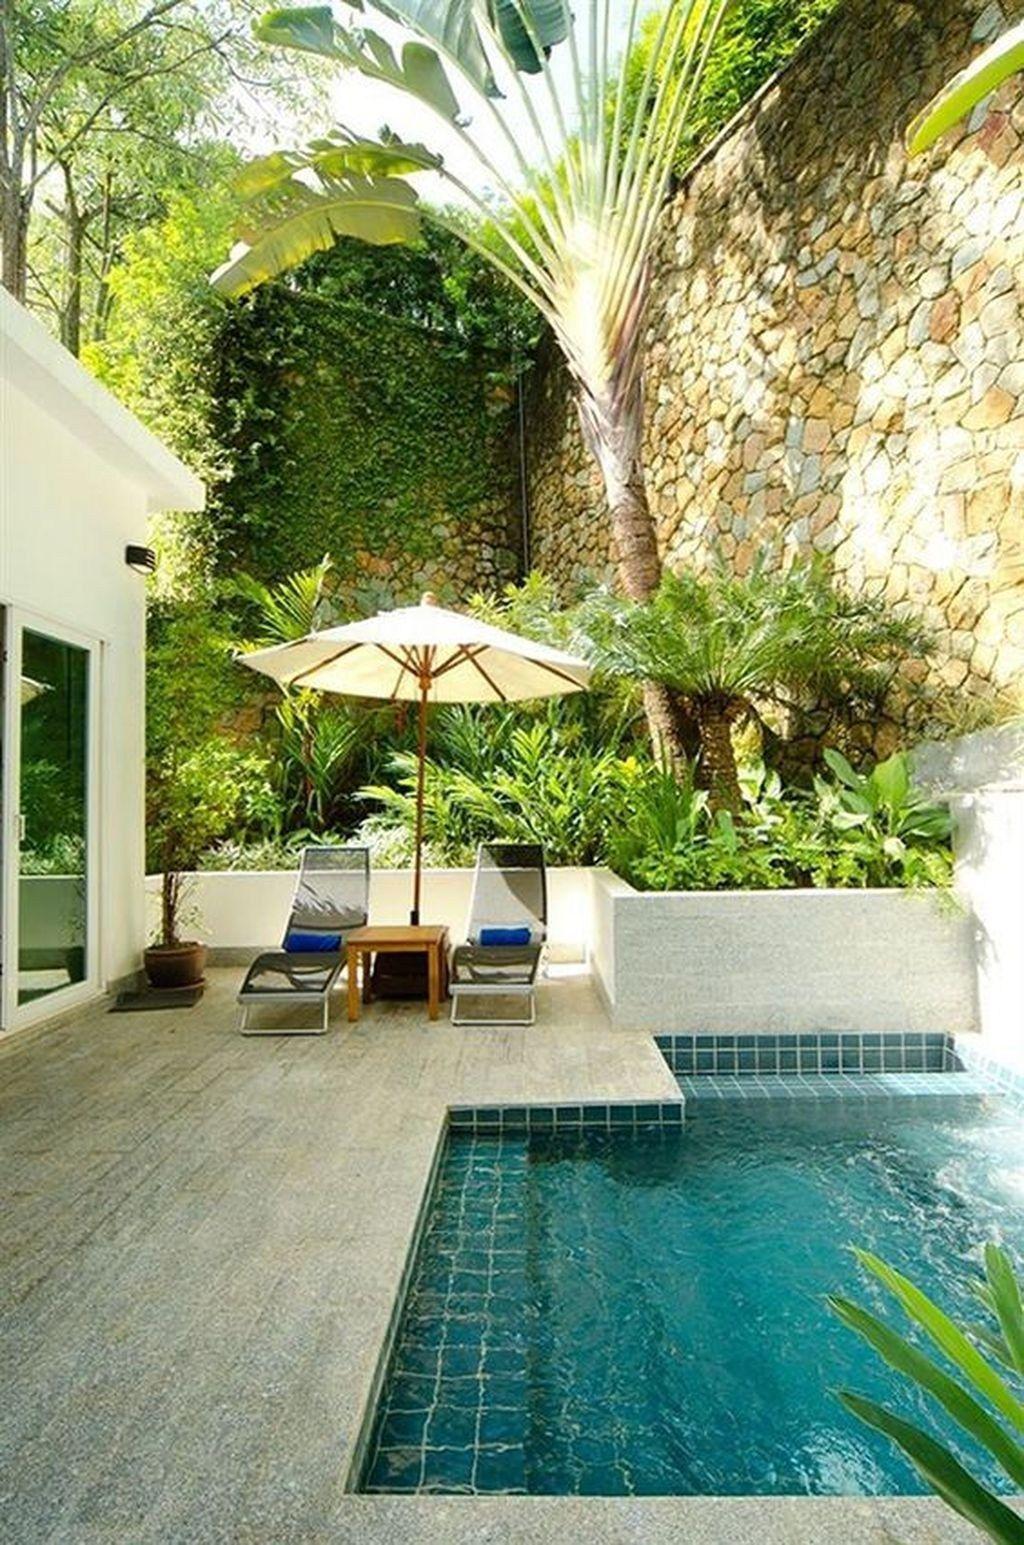 stunning small pool ideas for small backyard backyard pool